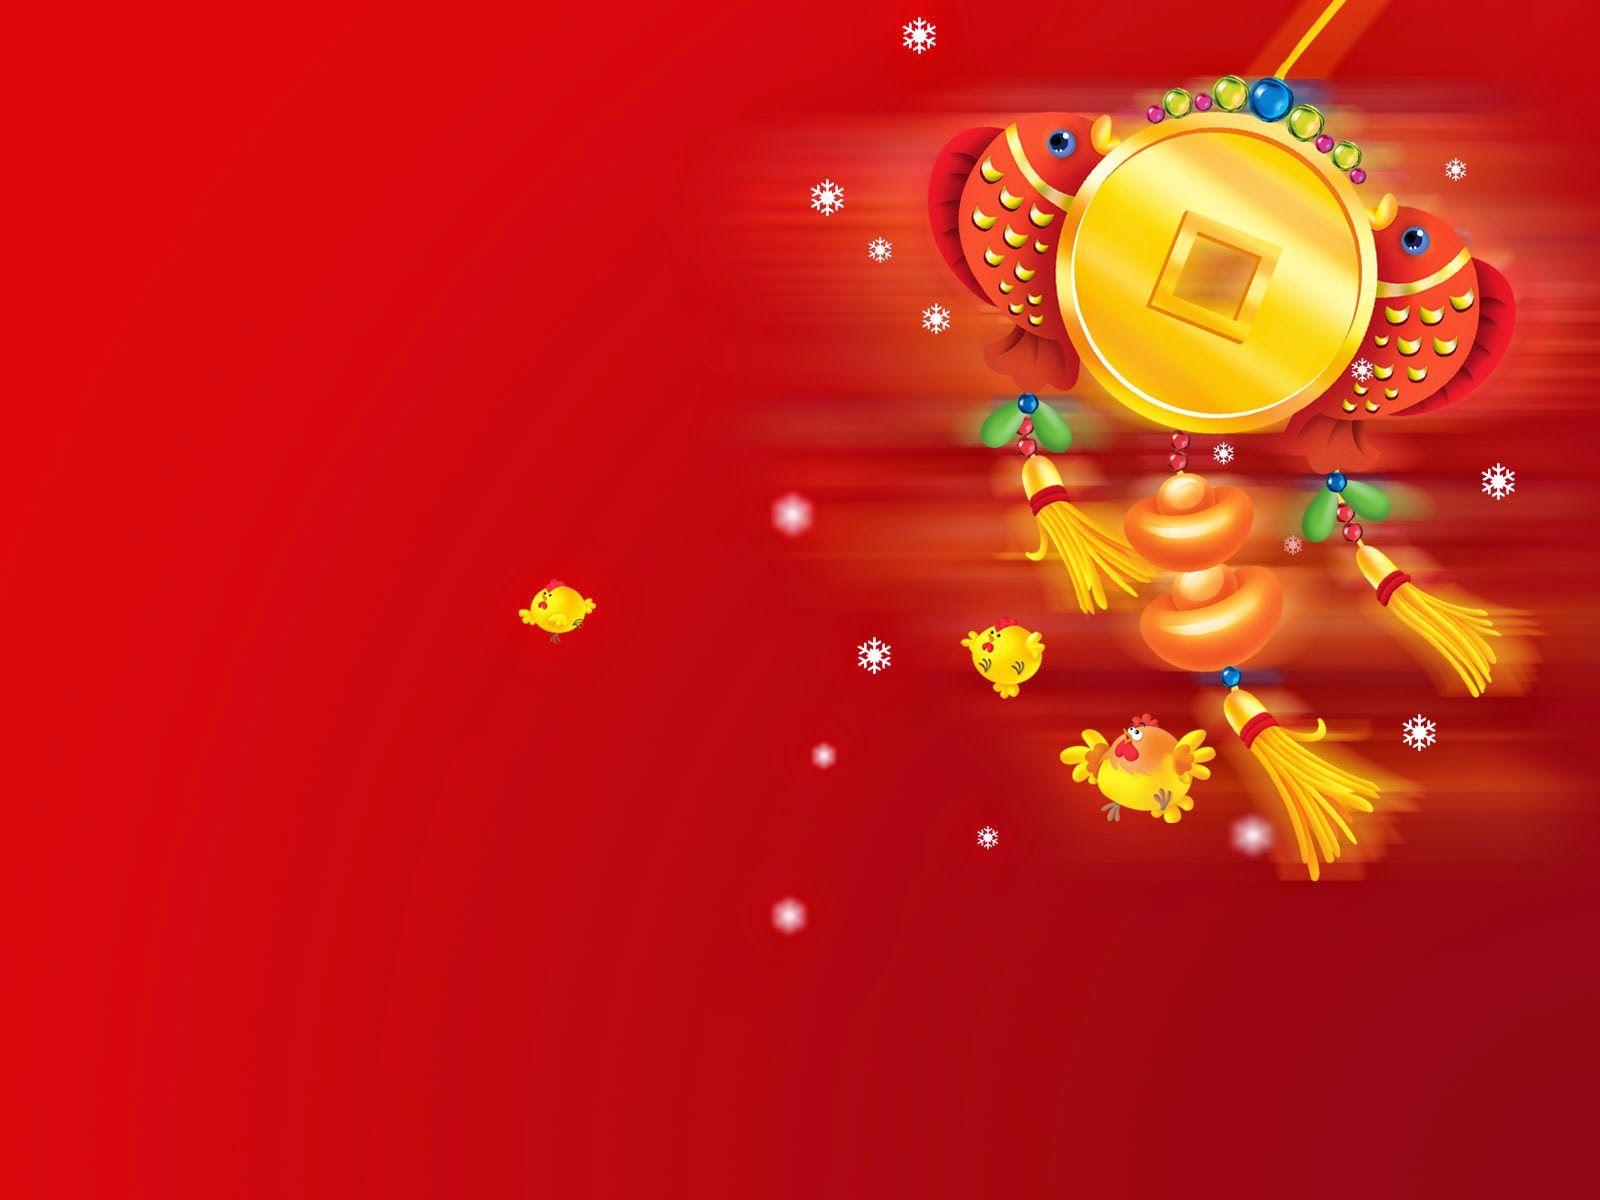 Happy New Year 2015 Chinese